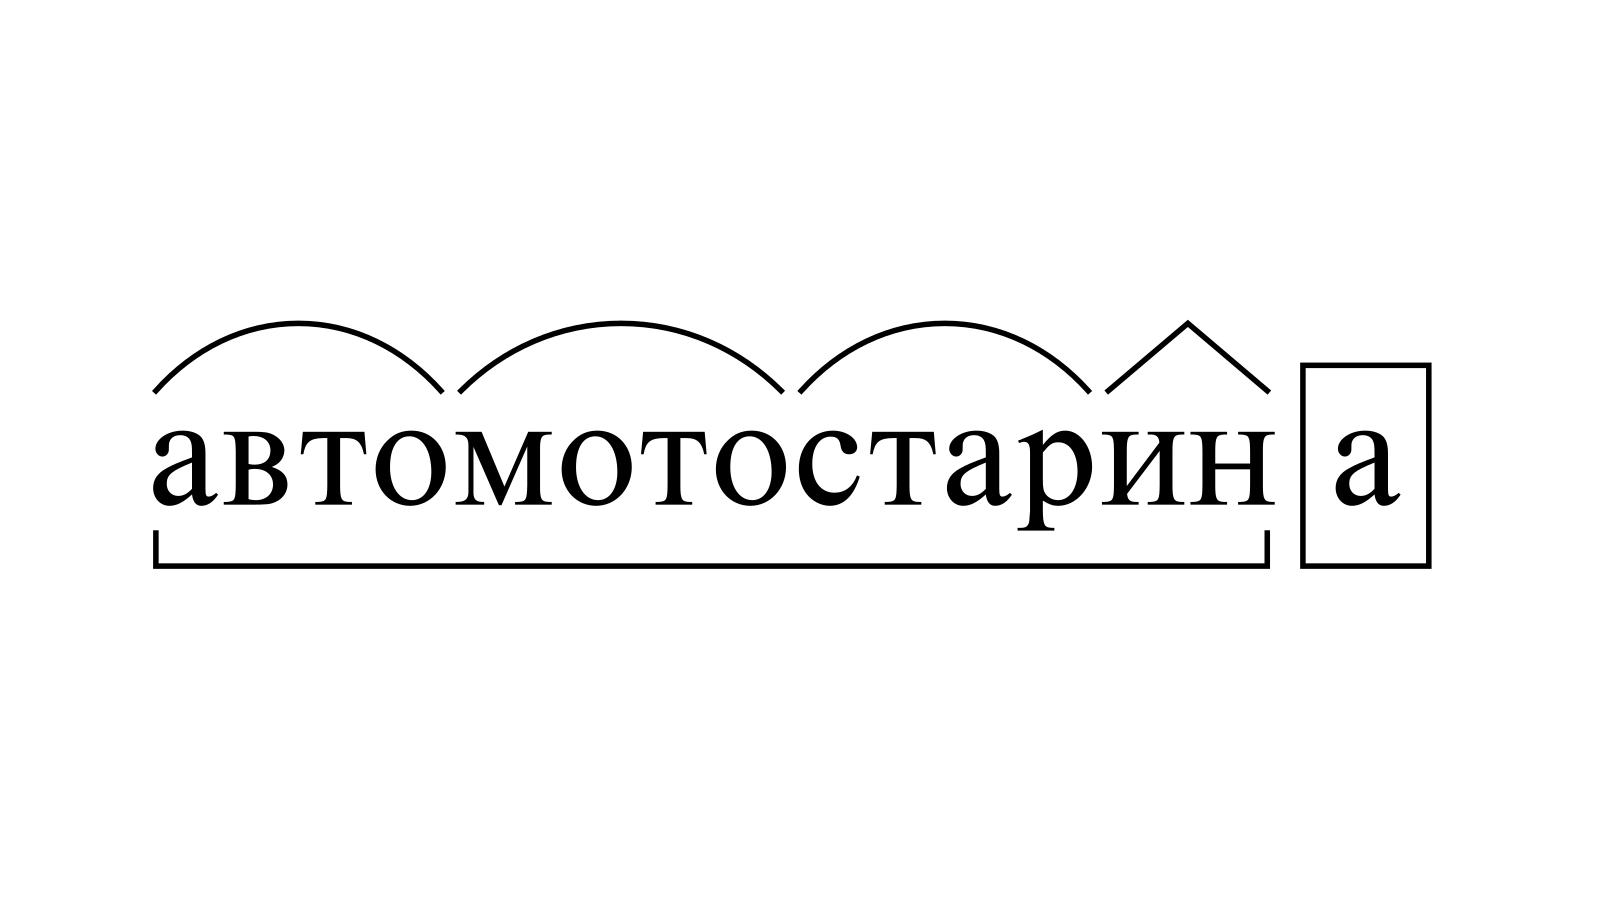 Разбор слова «автомотостарина» по составу